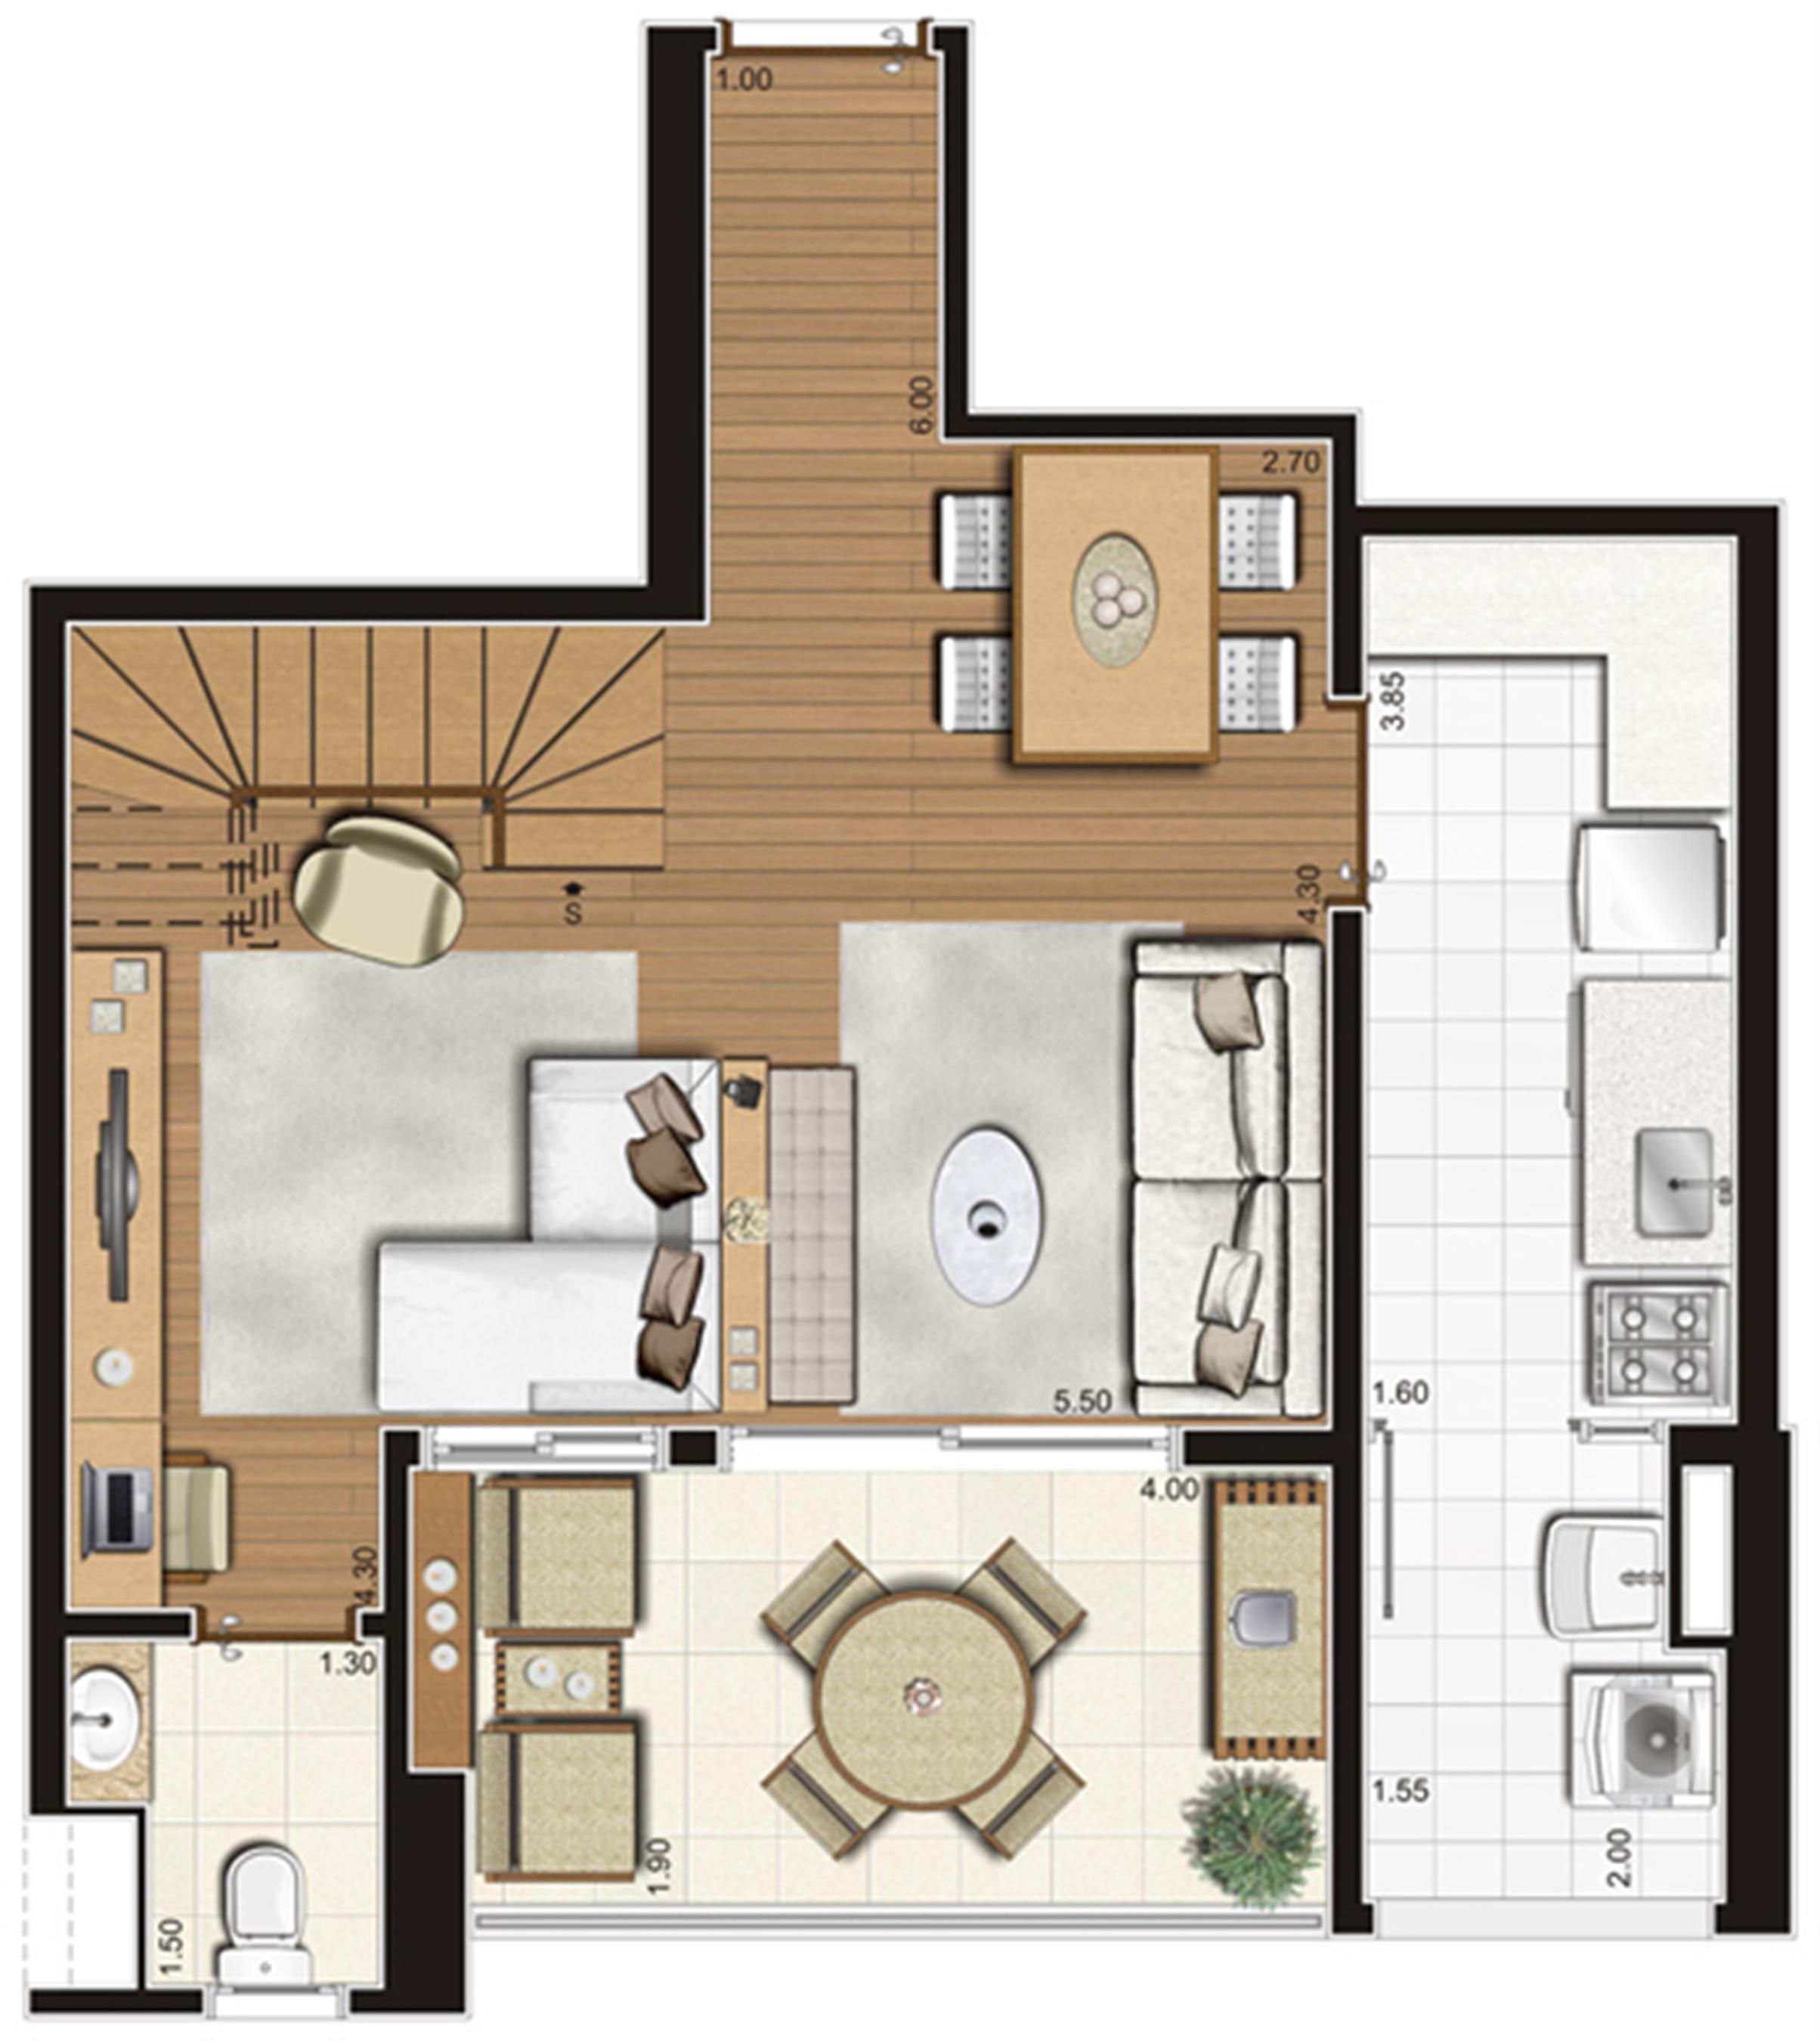 Planta-tipo do pavimento inferior do apartamento duplex de 95 m² privativos, finais 5 e 10 | Tempo Bello – Apartamento no  Campo Belo - São Paulo - São Paulo